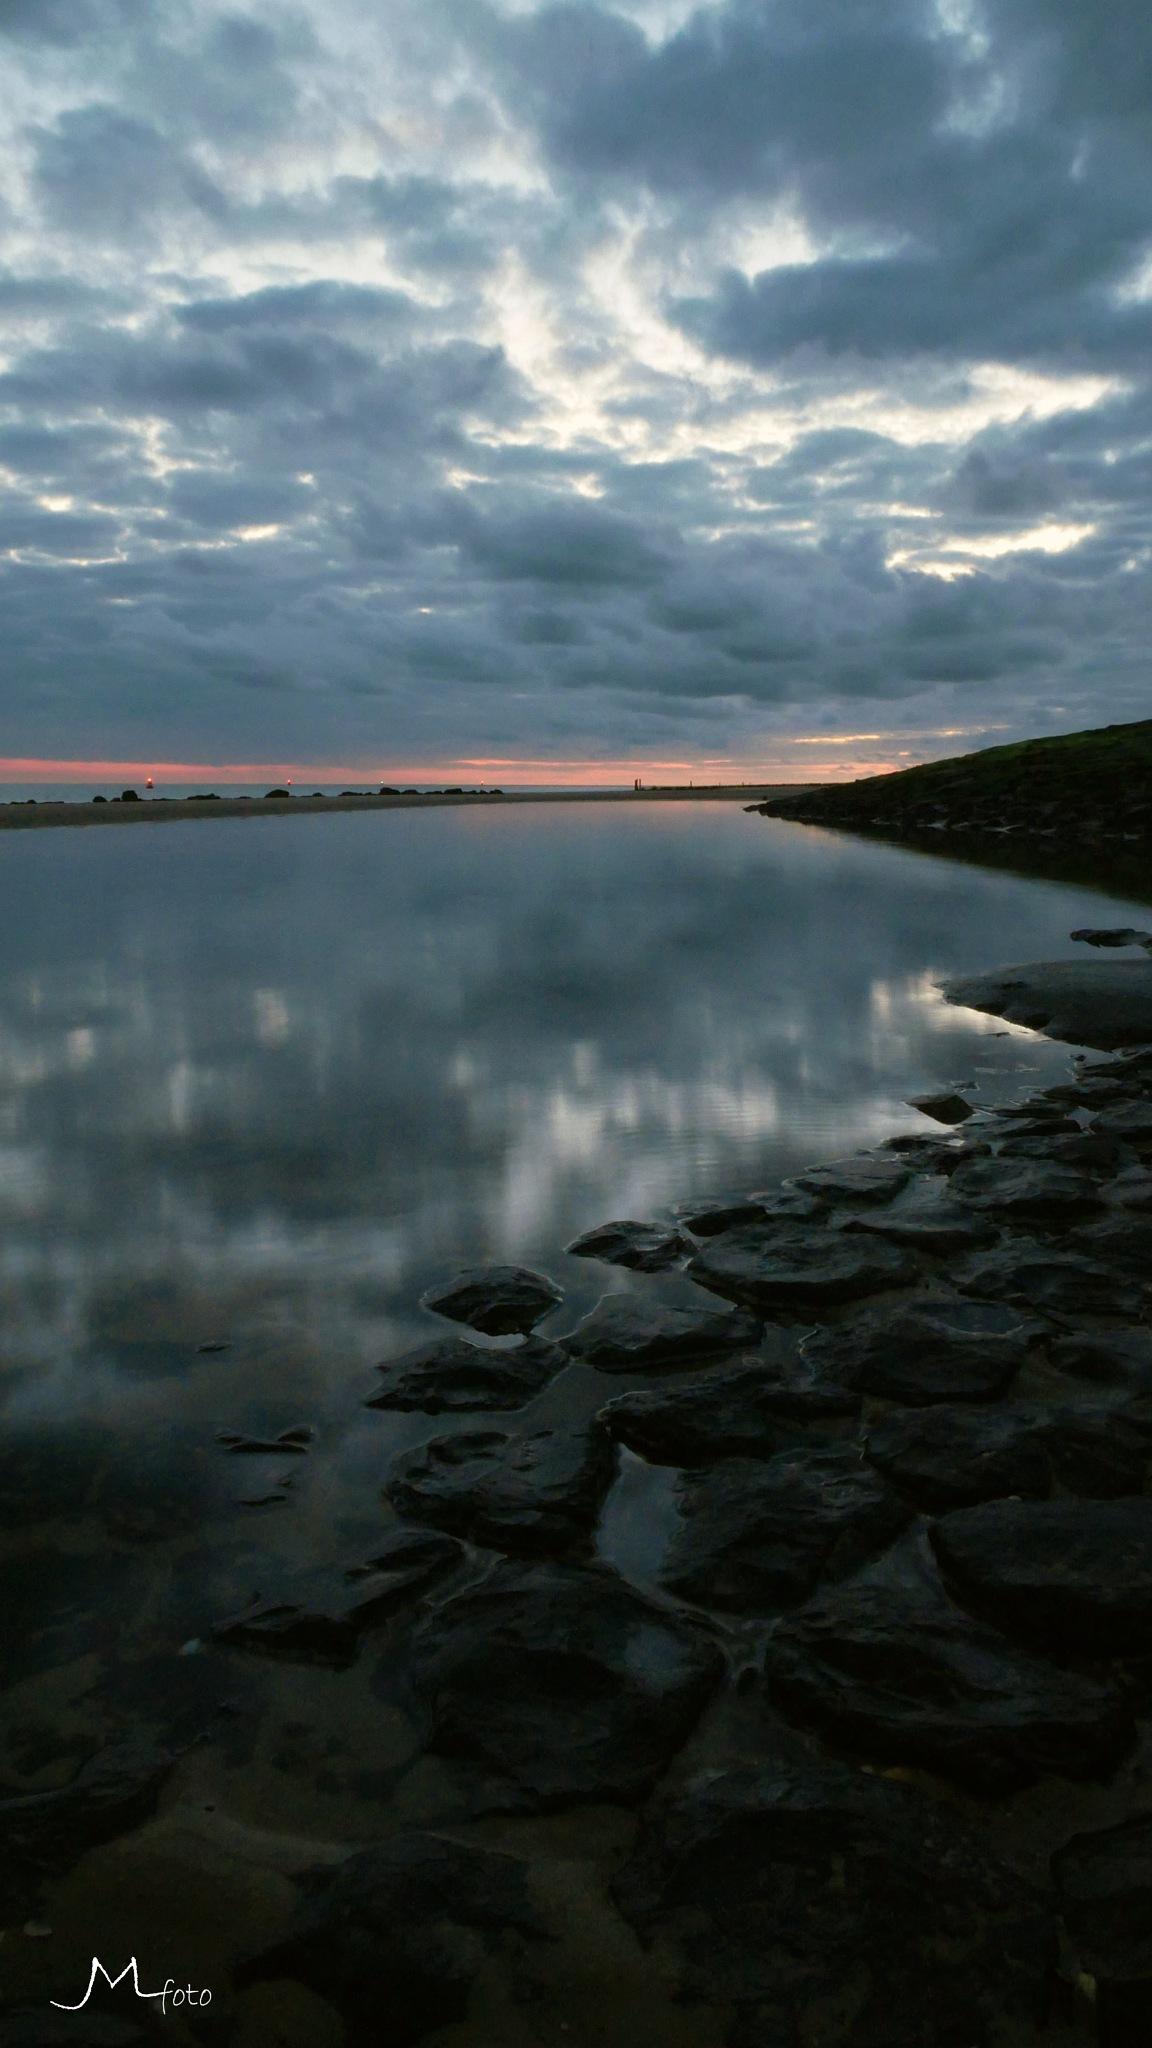 Evening Reflections 2 by JMLart